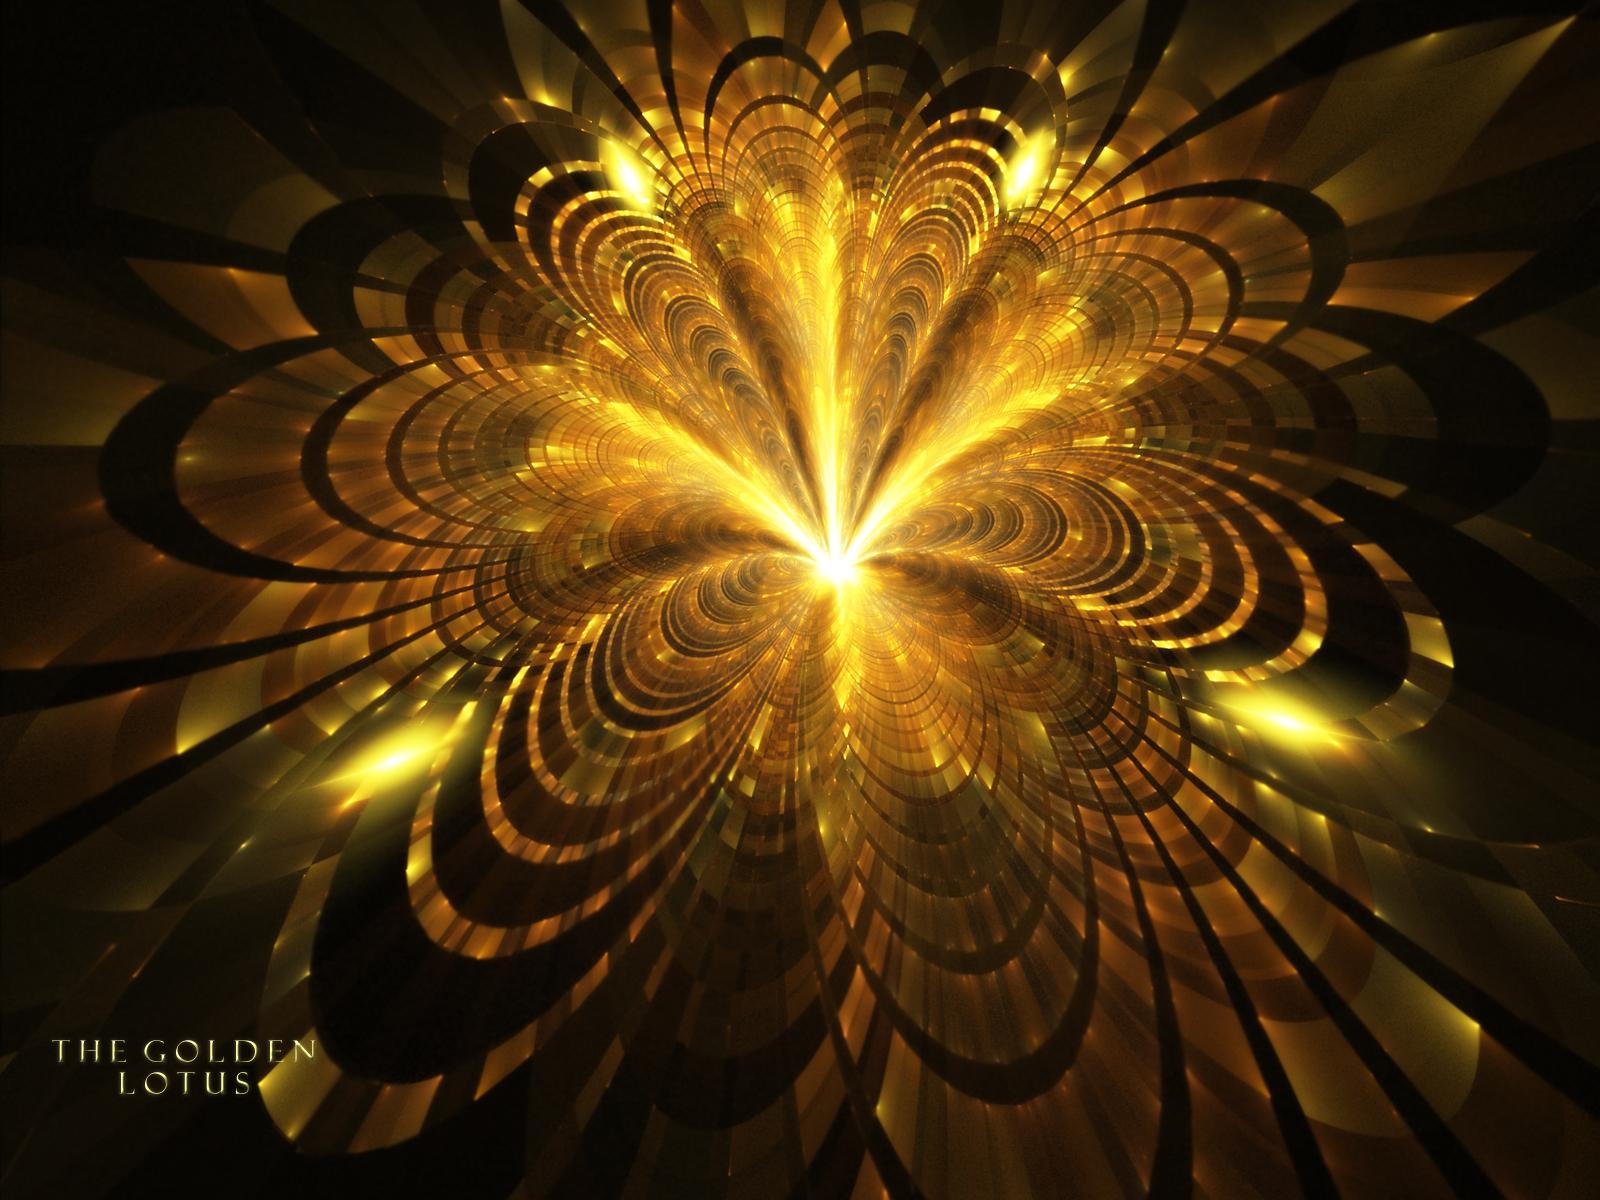 aura gold wallpaper - photo #3